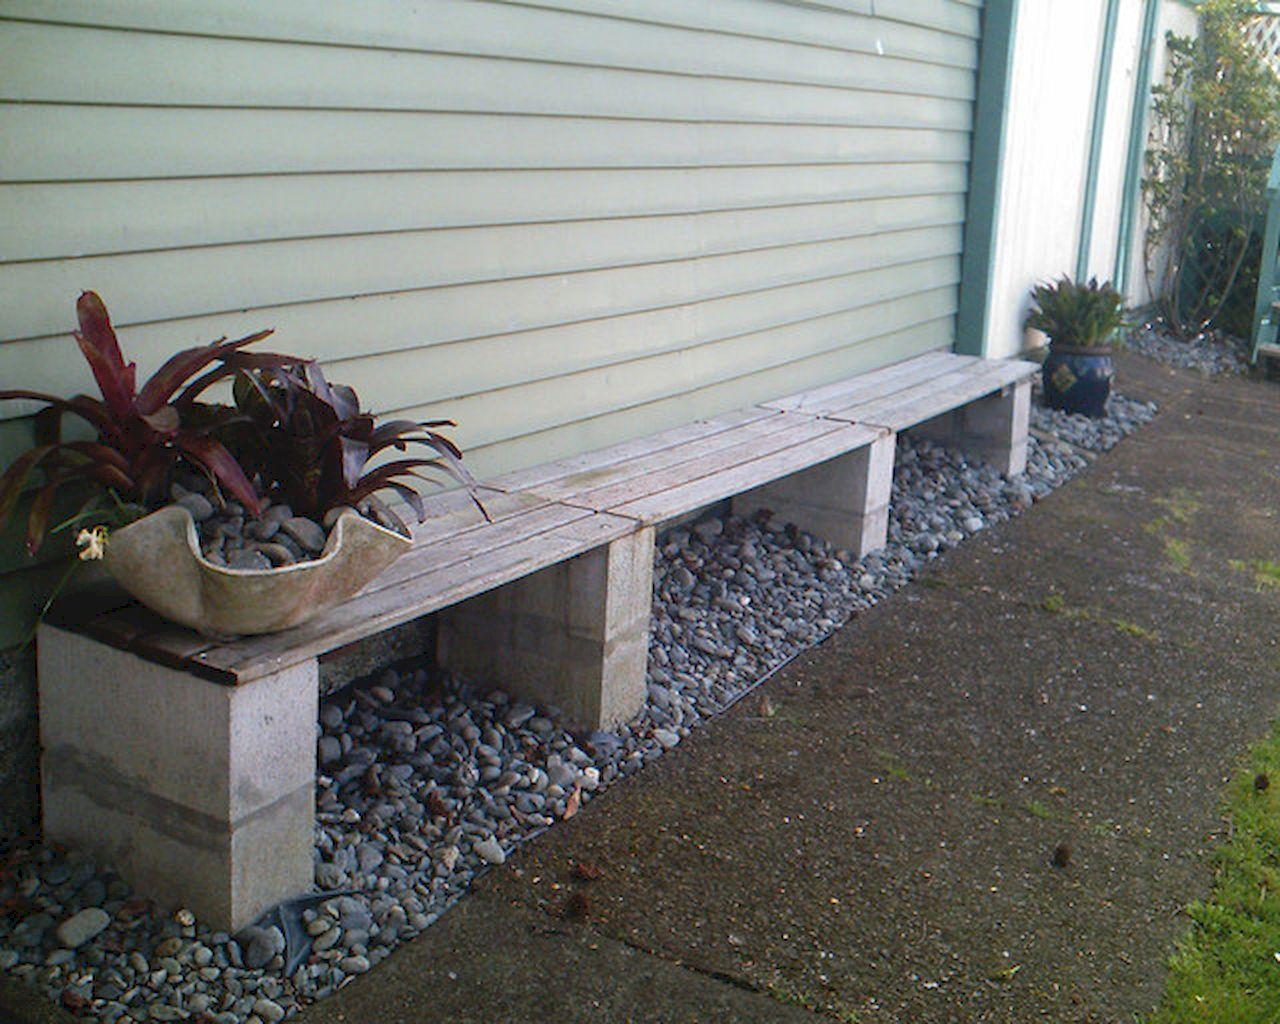 concrete block furniture ideas. 75 Creative DIY Cinder Block Furniture And Decor Ideas - Decorapartment Concrete